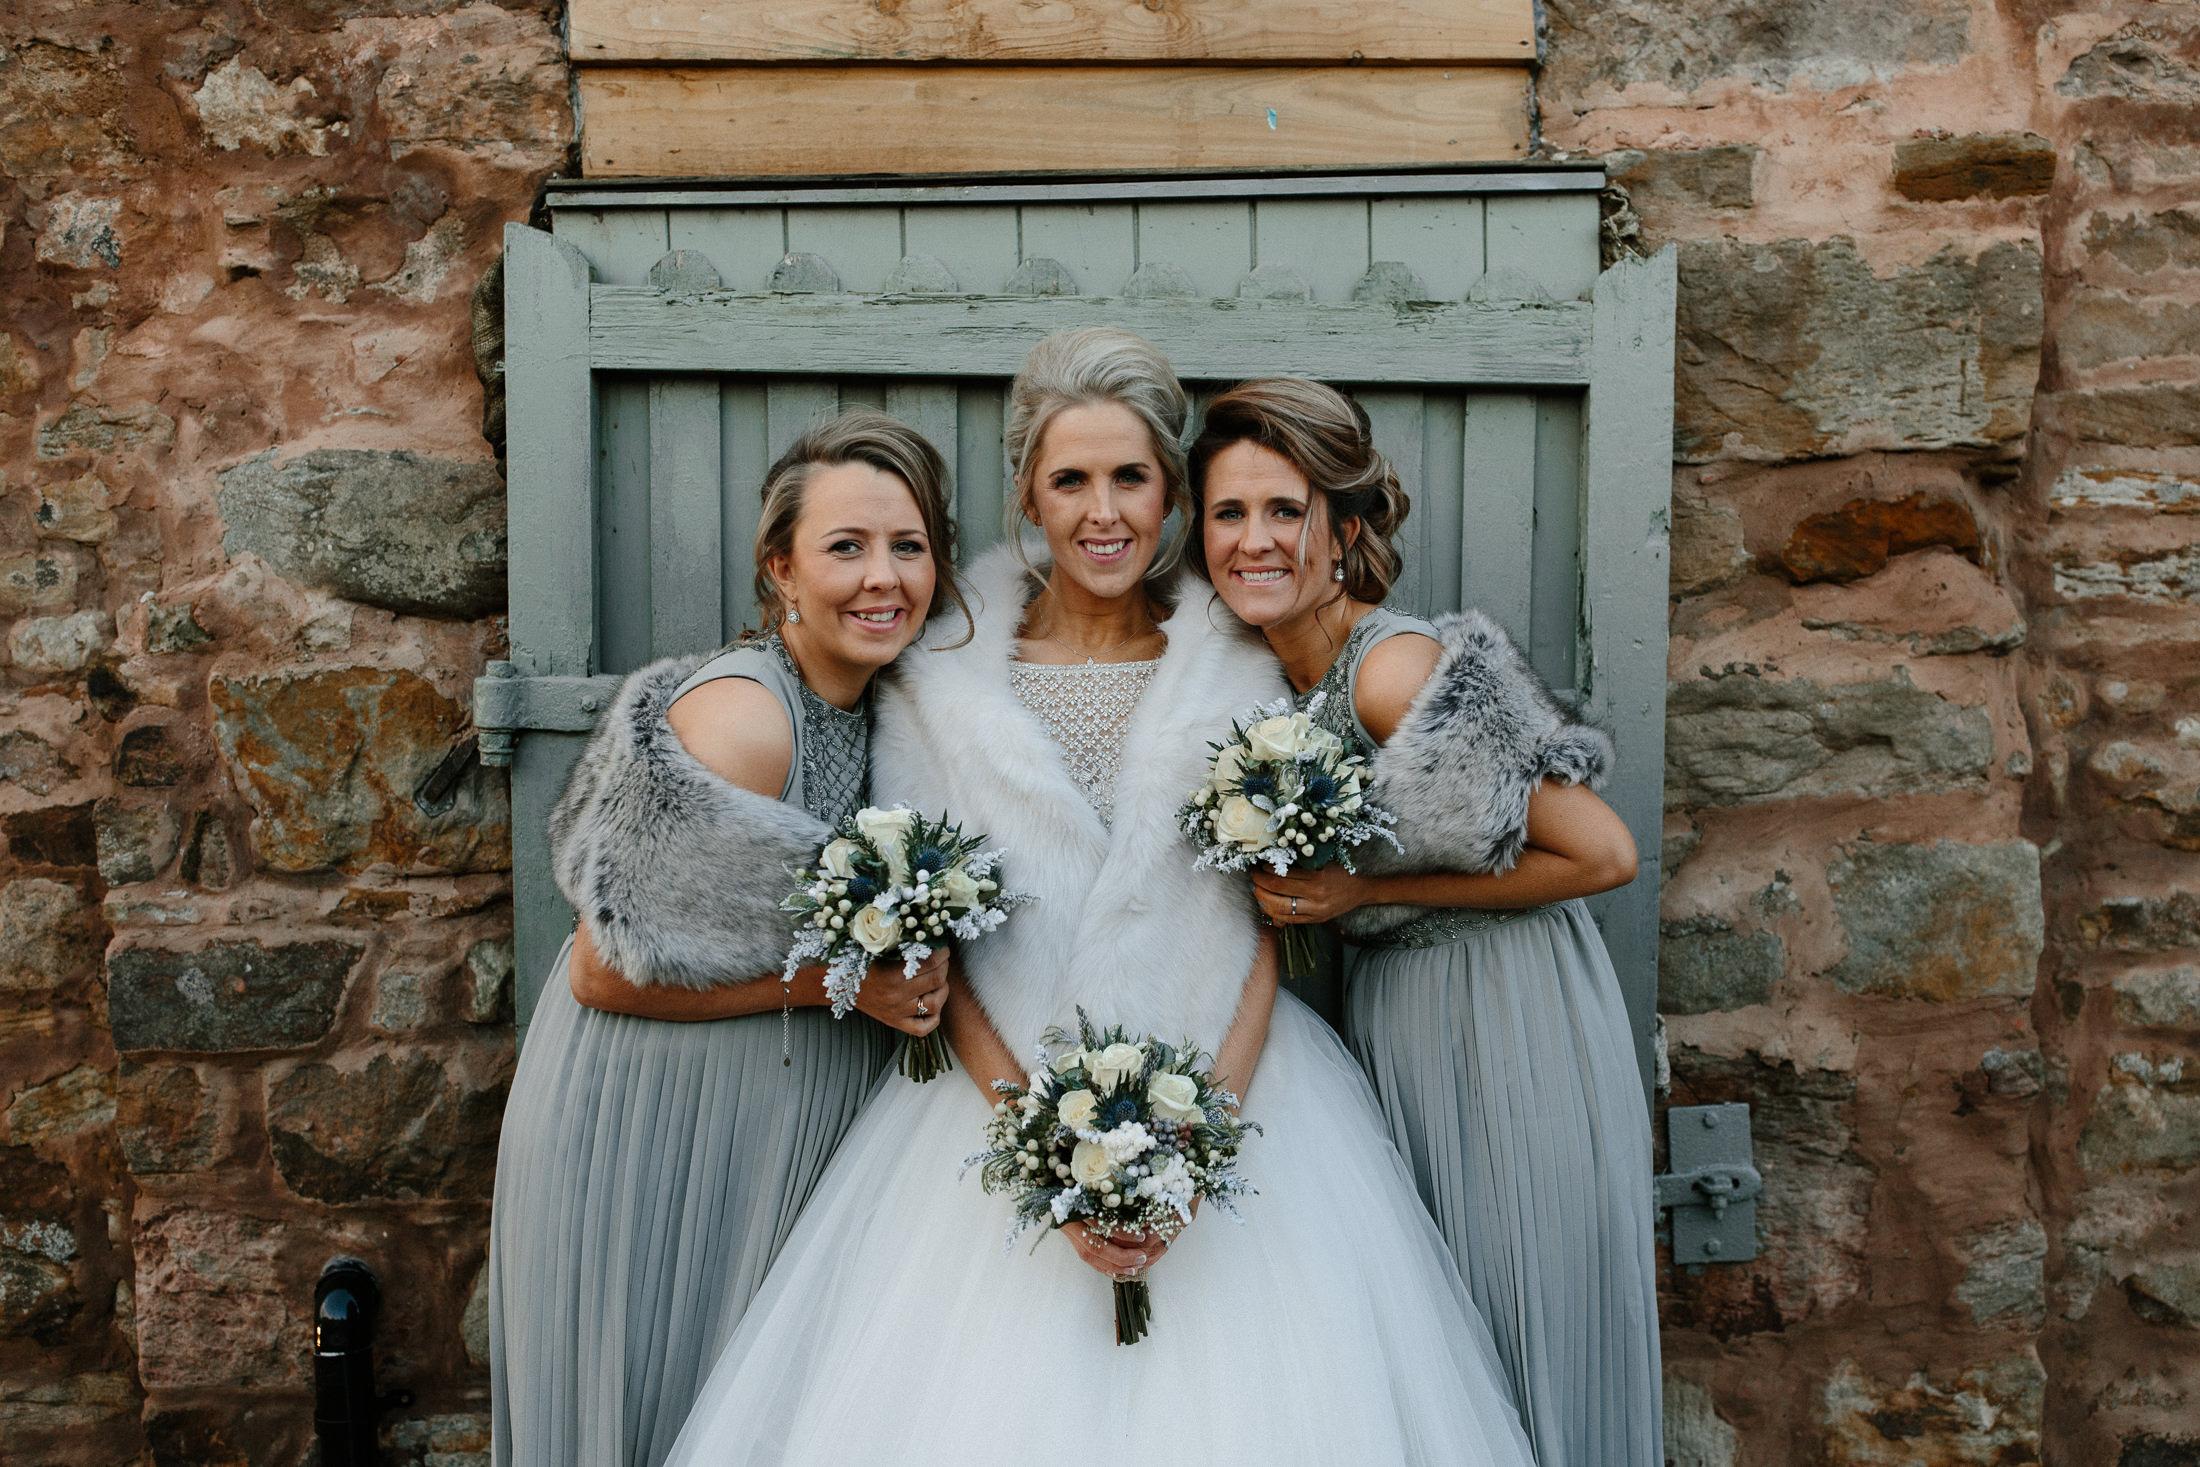 Kayleigh-Michael-Cow-Shed-Cowshed-Crail-Fife-Coastal-Rustic-Barn-Lianne-Mackay-Wedding-Photography-Photographer-Edinburgh-Glasgow-Scotland-WEB-RES-475.jpg